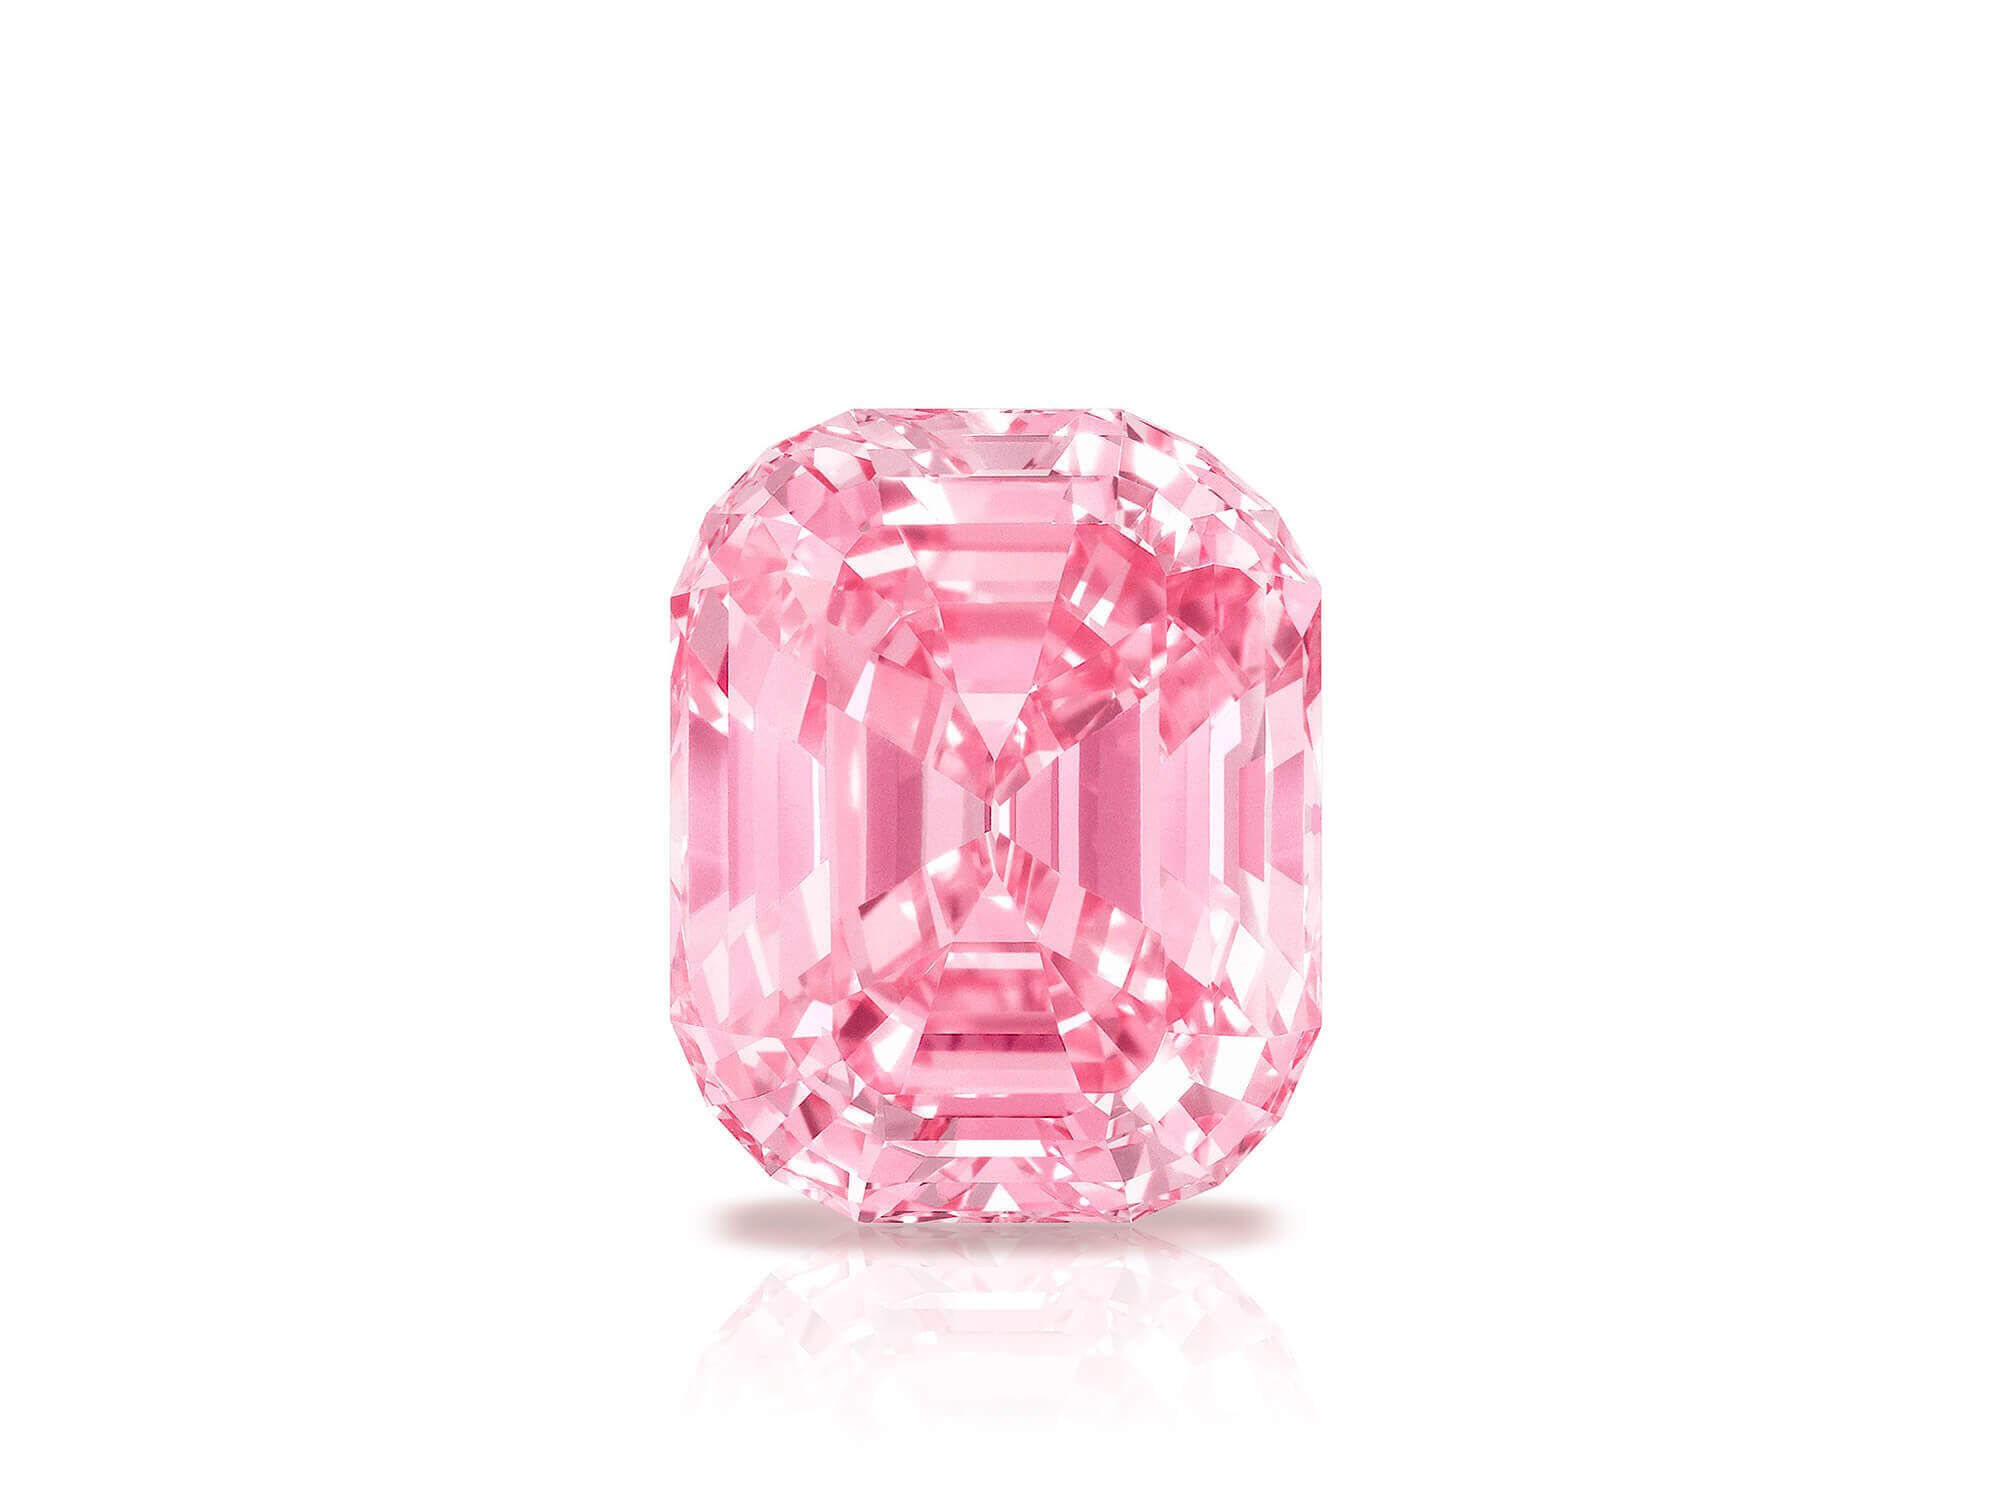 The Graff Pink - a 23.88 carats Fancy Vivid Pink Internally Flawless Type IIa diamond